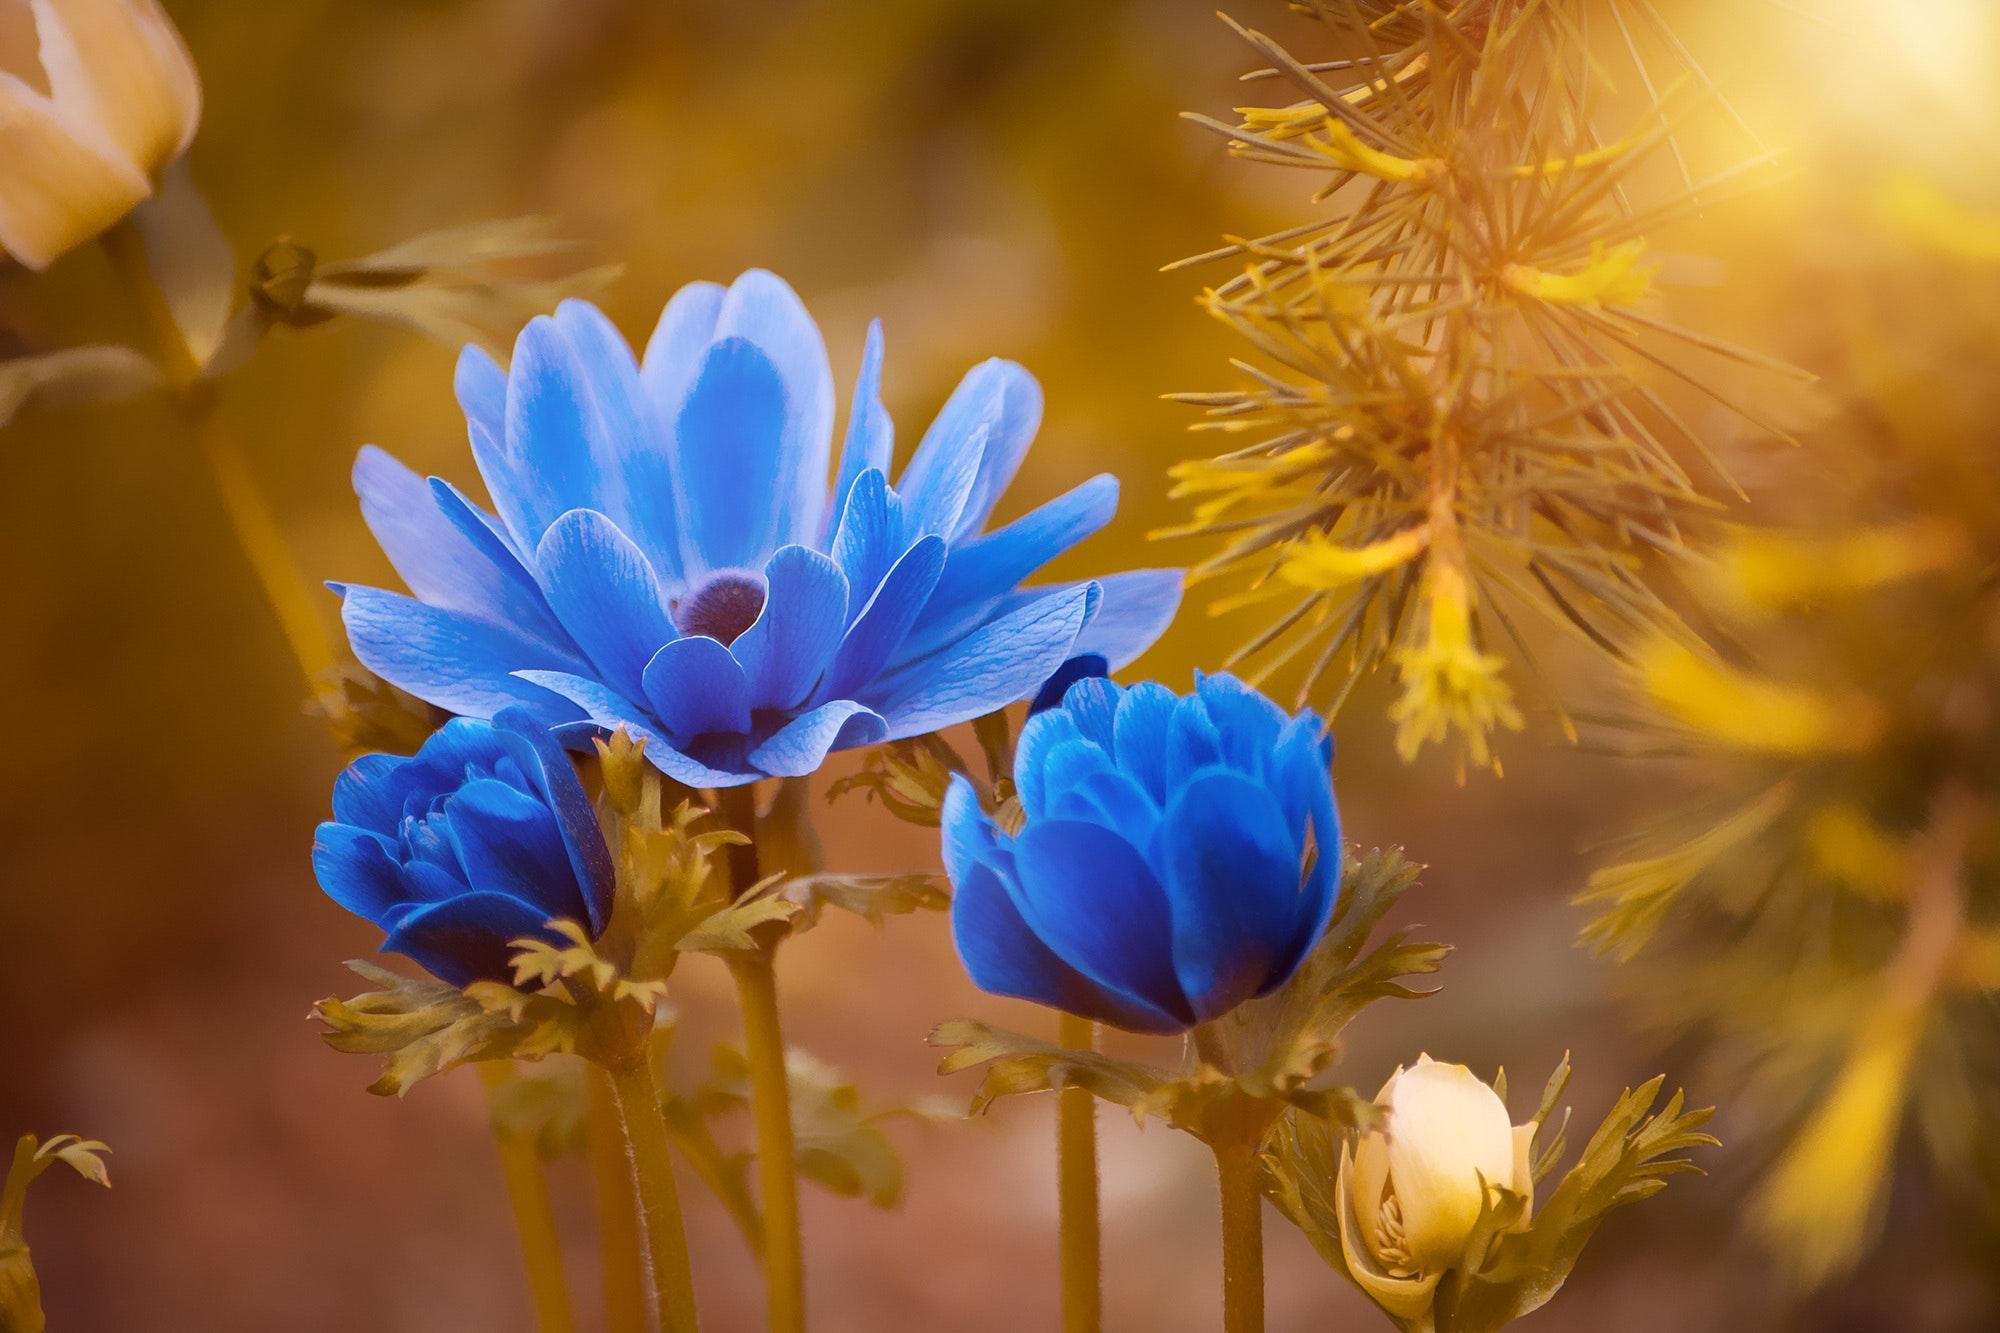 Hd Flower Image Wallpaper Download Free